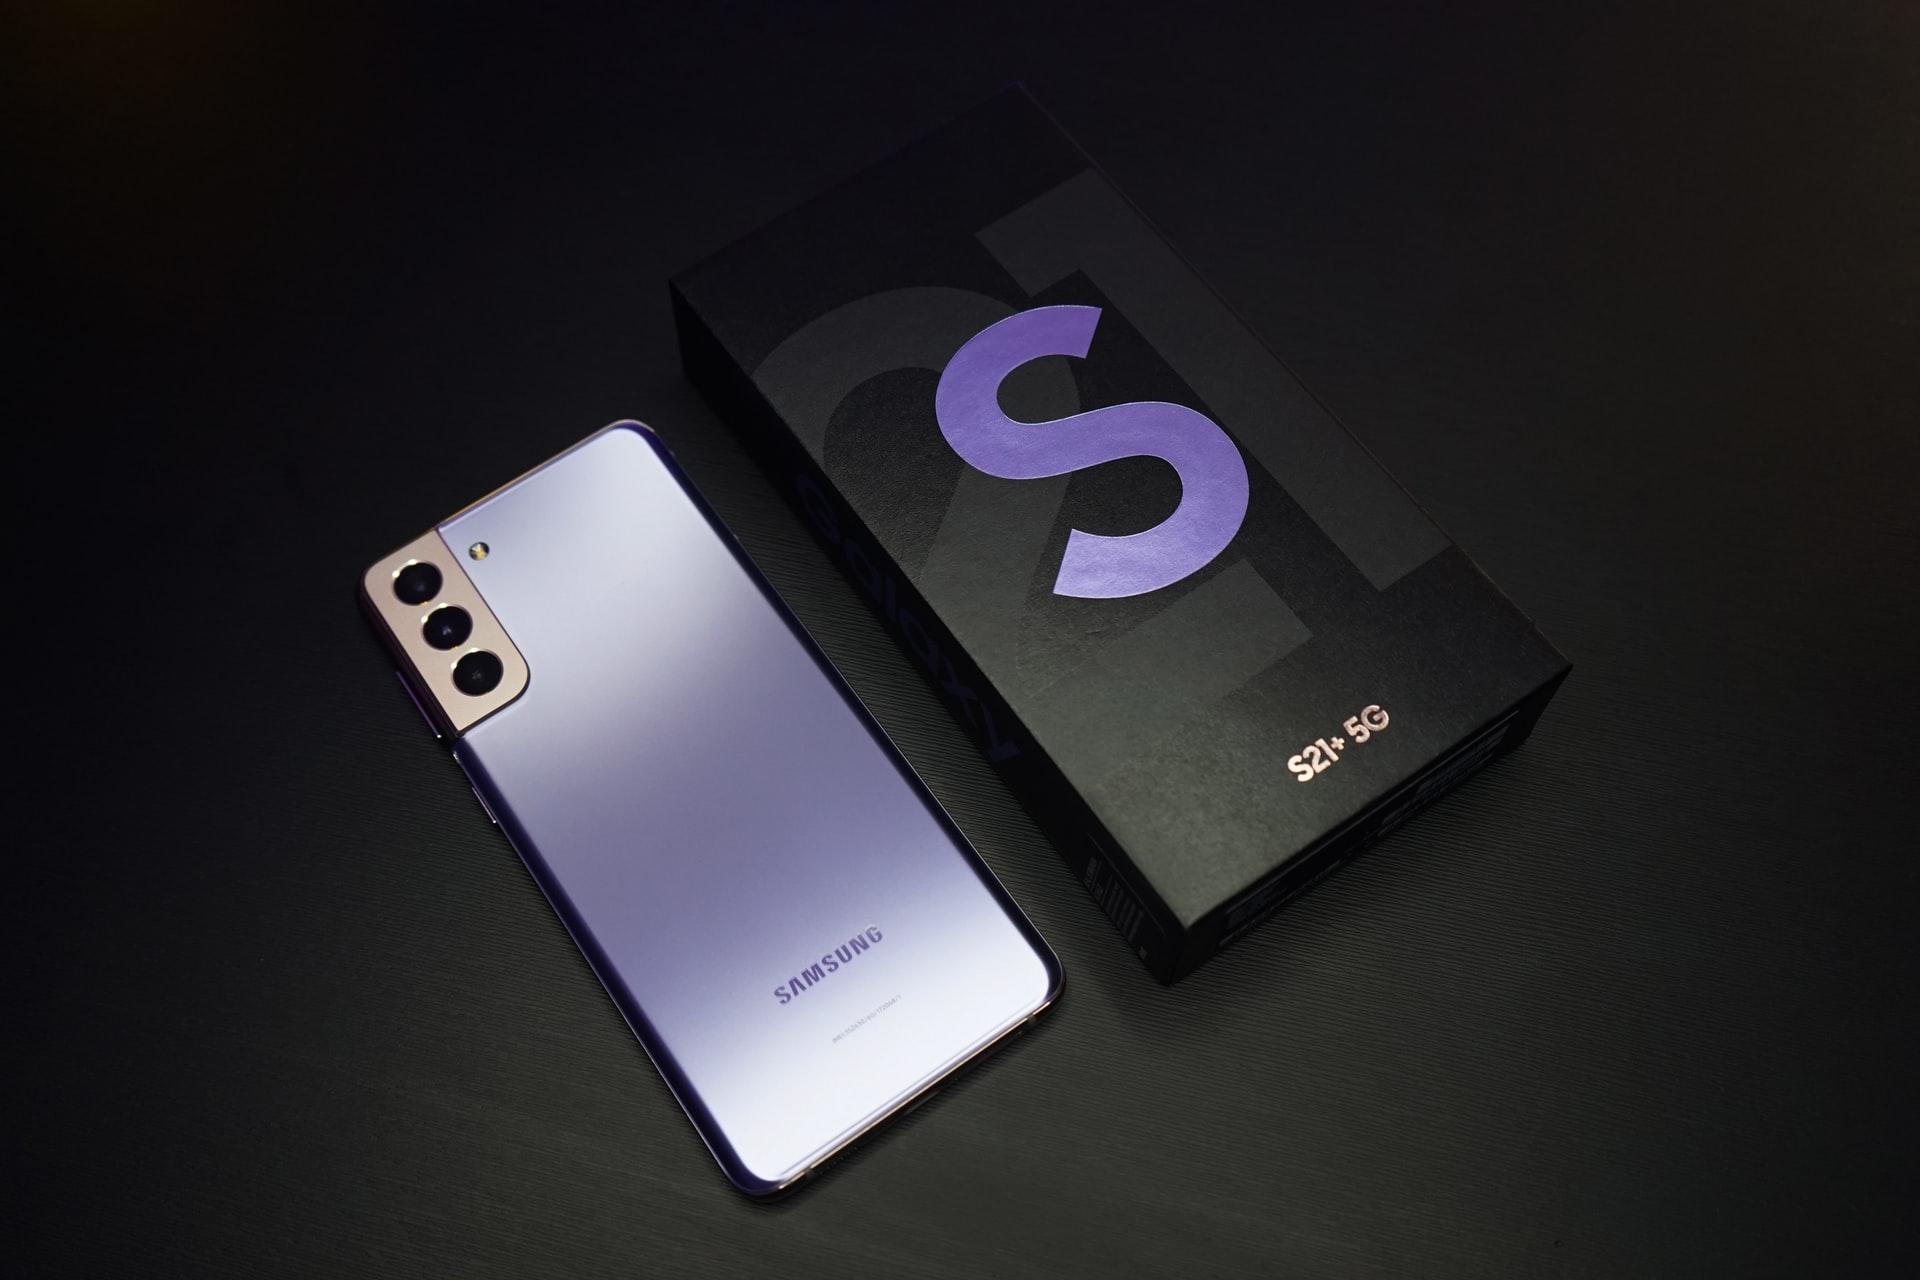 ¿Cómo transferir chats de WhatsApp iPhone a Samsung?